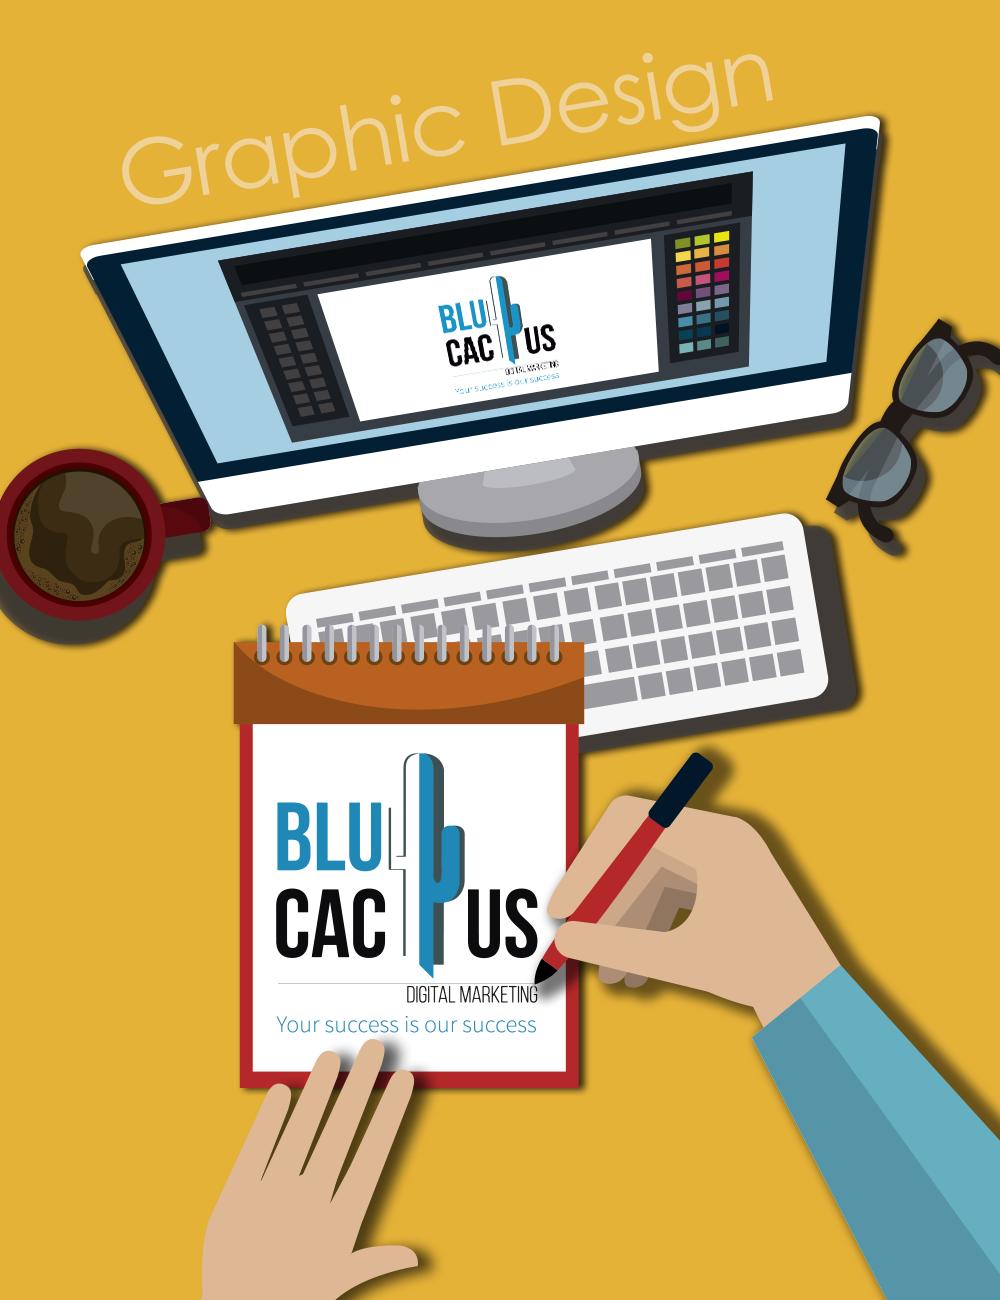 BluCactus - Graphic Designer drawing BluCactus Logo on his sketch book